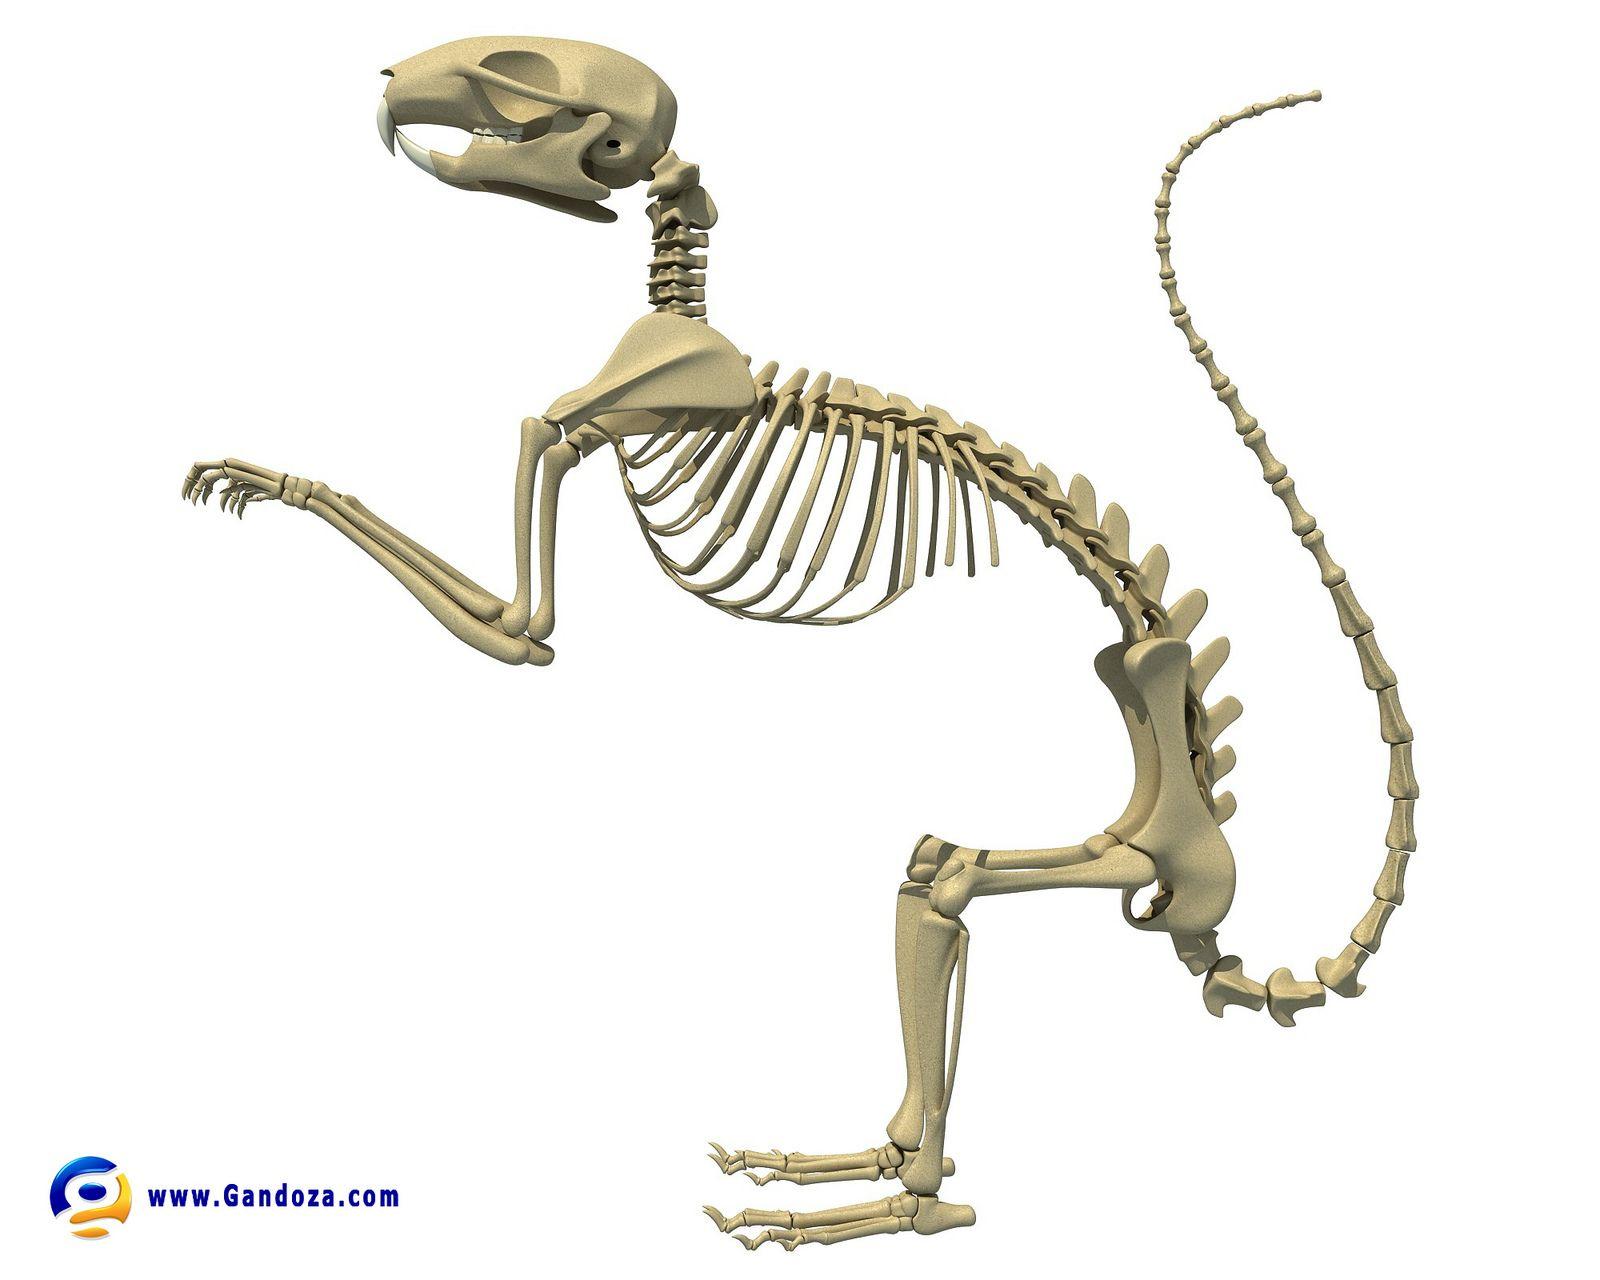 squirrel skeleton pinterest squirrel skeletons and 3d rh pinterest co uk Squirrel Organs Diagram Squirrel Monkey Diagram